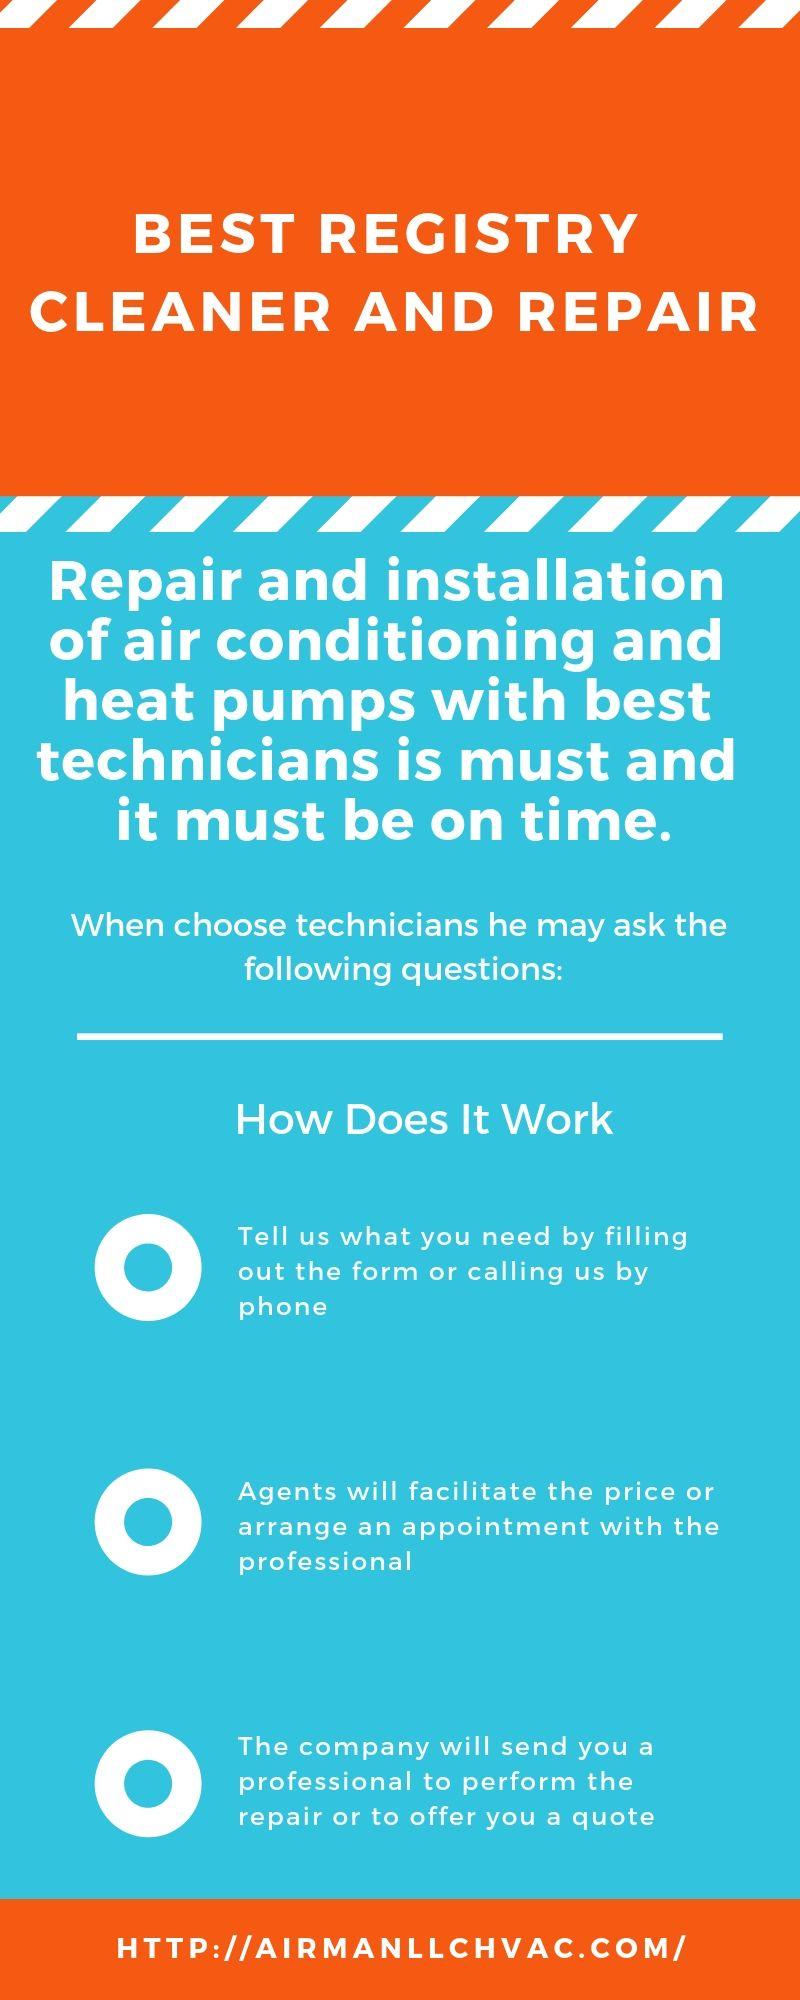 Best Registry Cleaner and Repair Heat pump, Repair, Duct